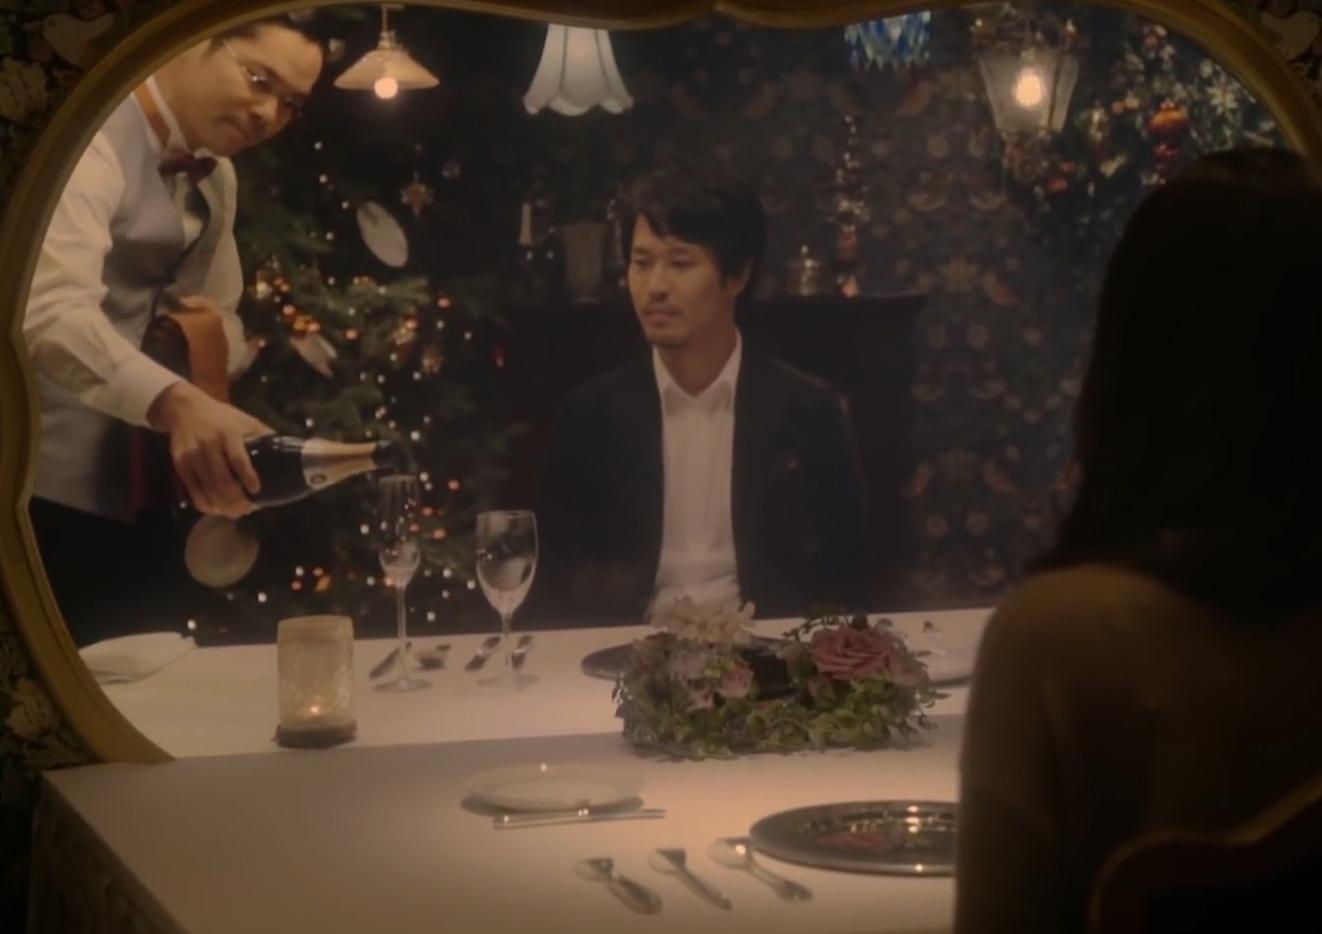 KDDI unites long-distance lovers for Christmas